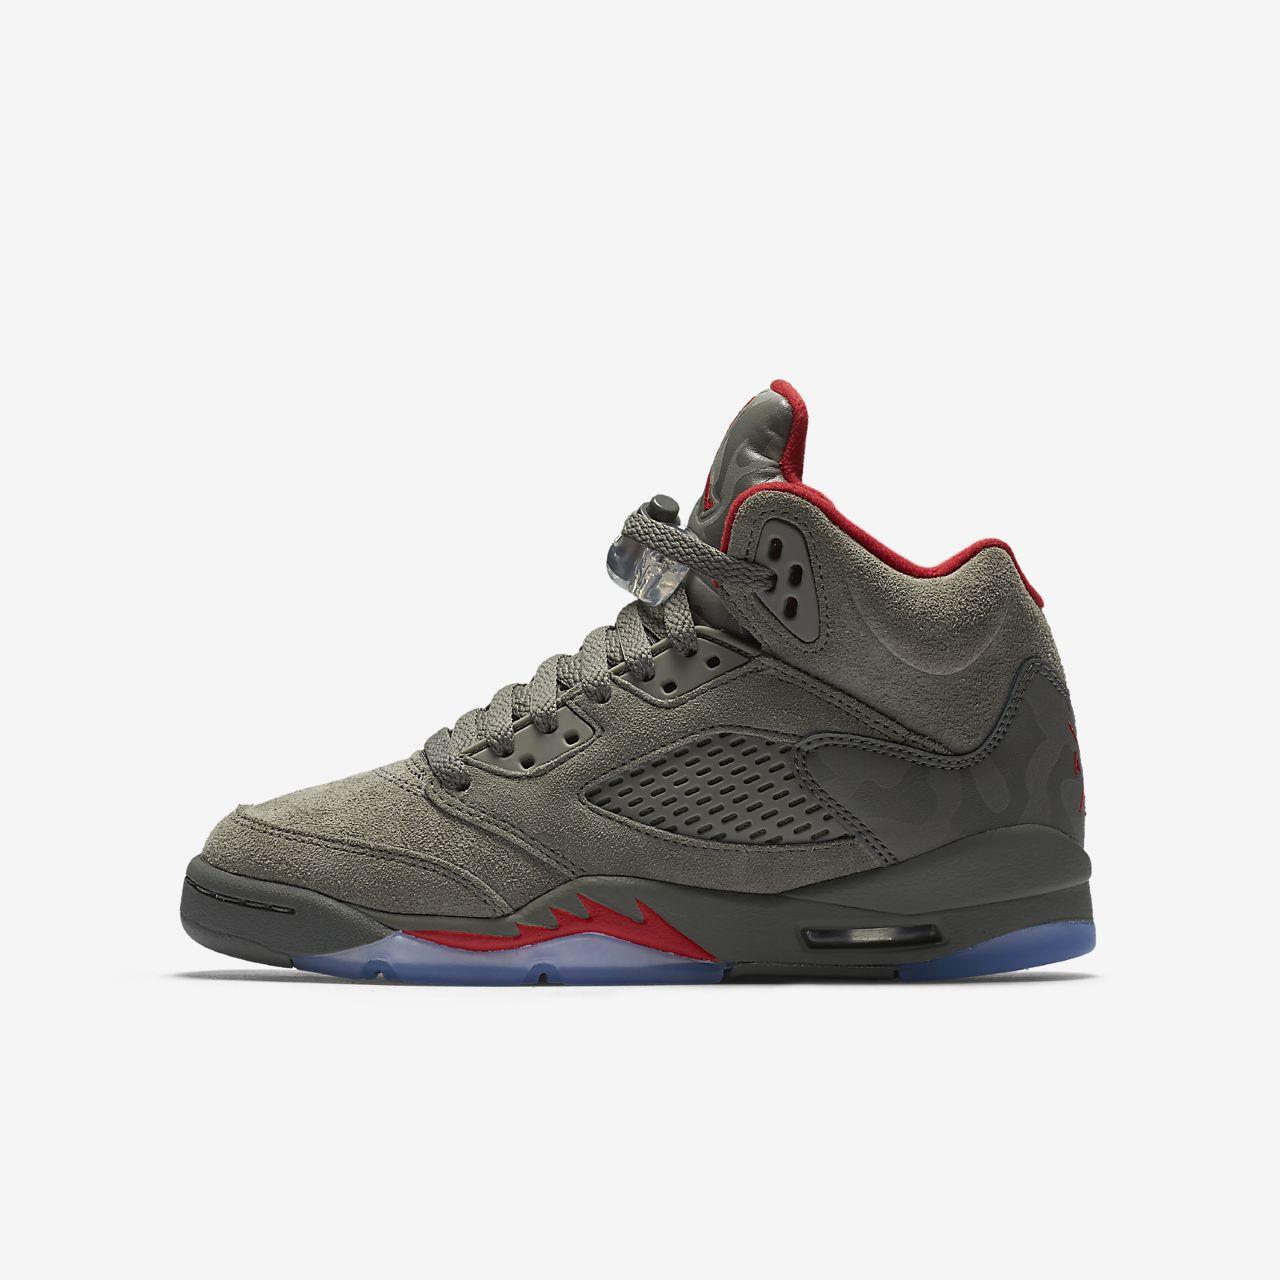 360e89d00a11 reduced air jordan 22 white red blackretro jordansjordan shoes for  saleretailer 5b0f9 88849  australia calzado para niños talla grande air  jordan 5 retro ...